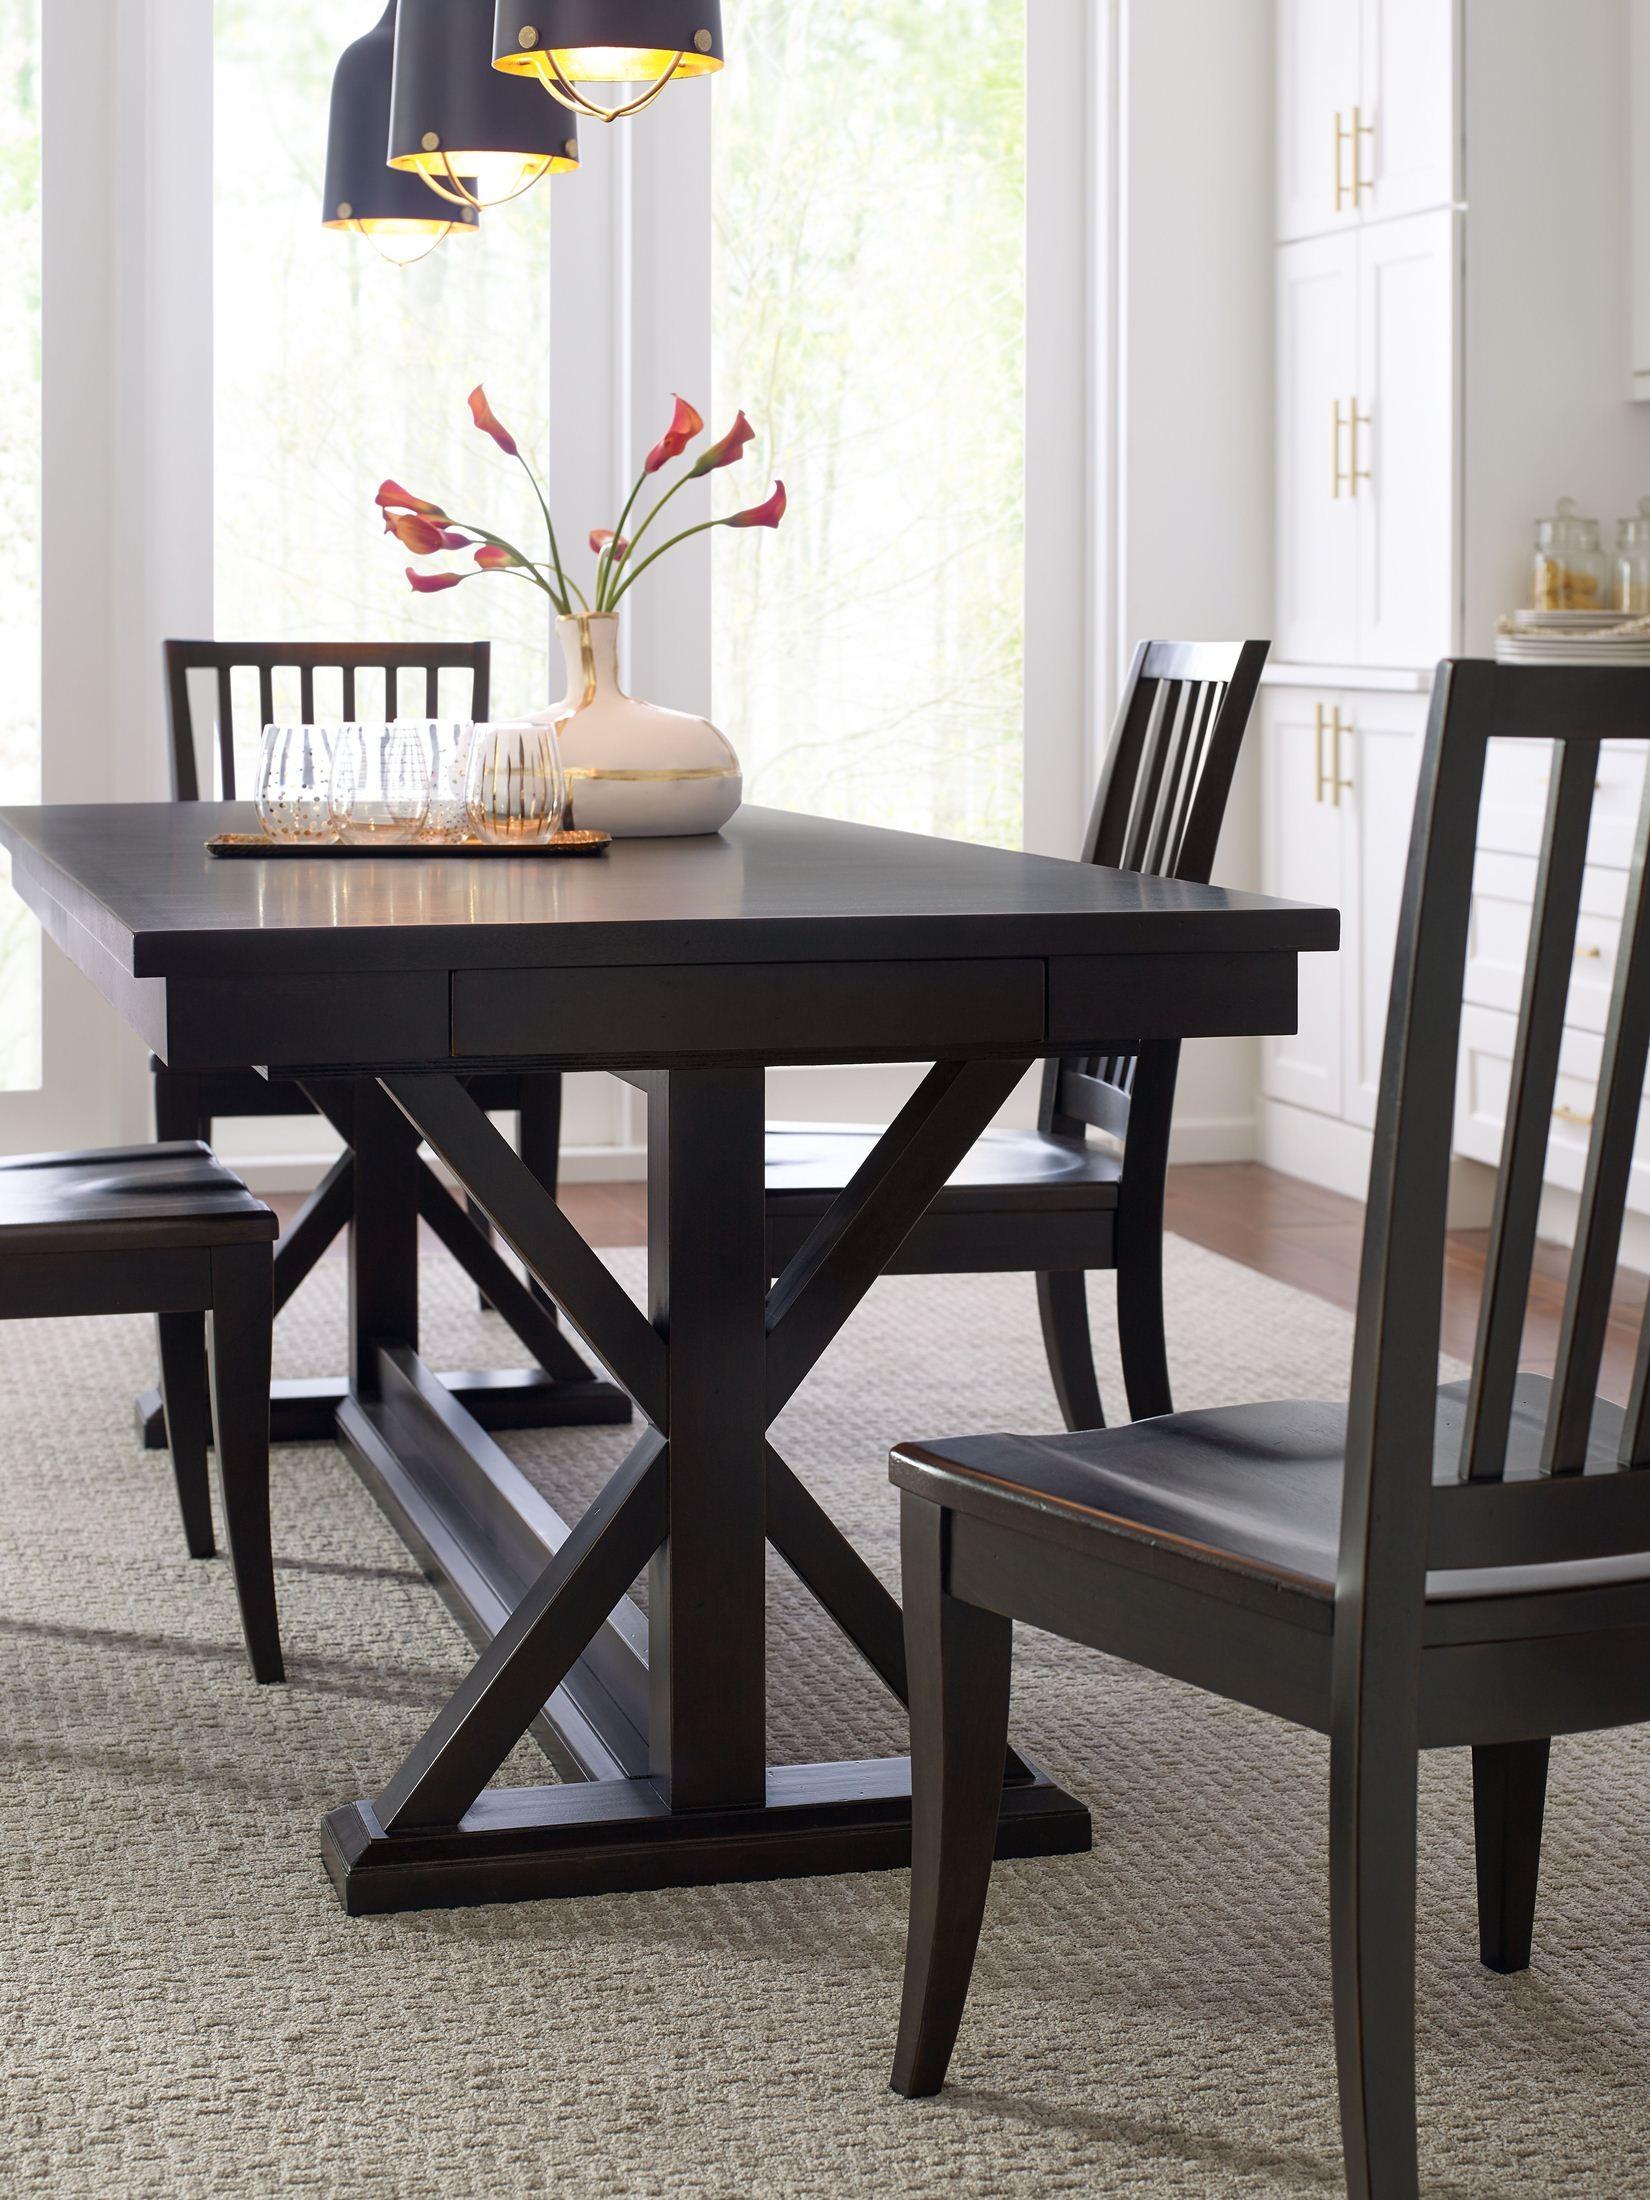 Everyday Sea Salt Trestle Dining Table From Racheal Ray